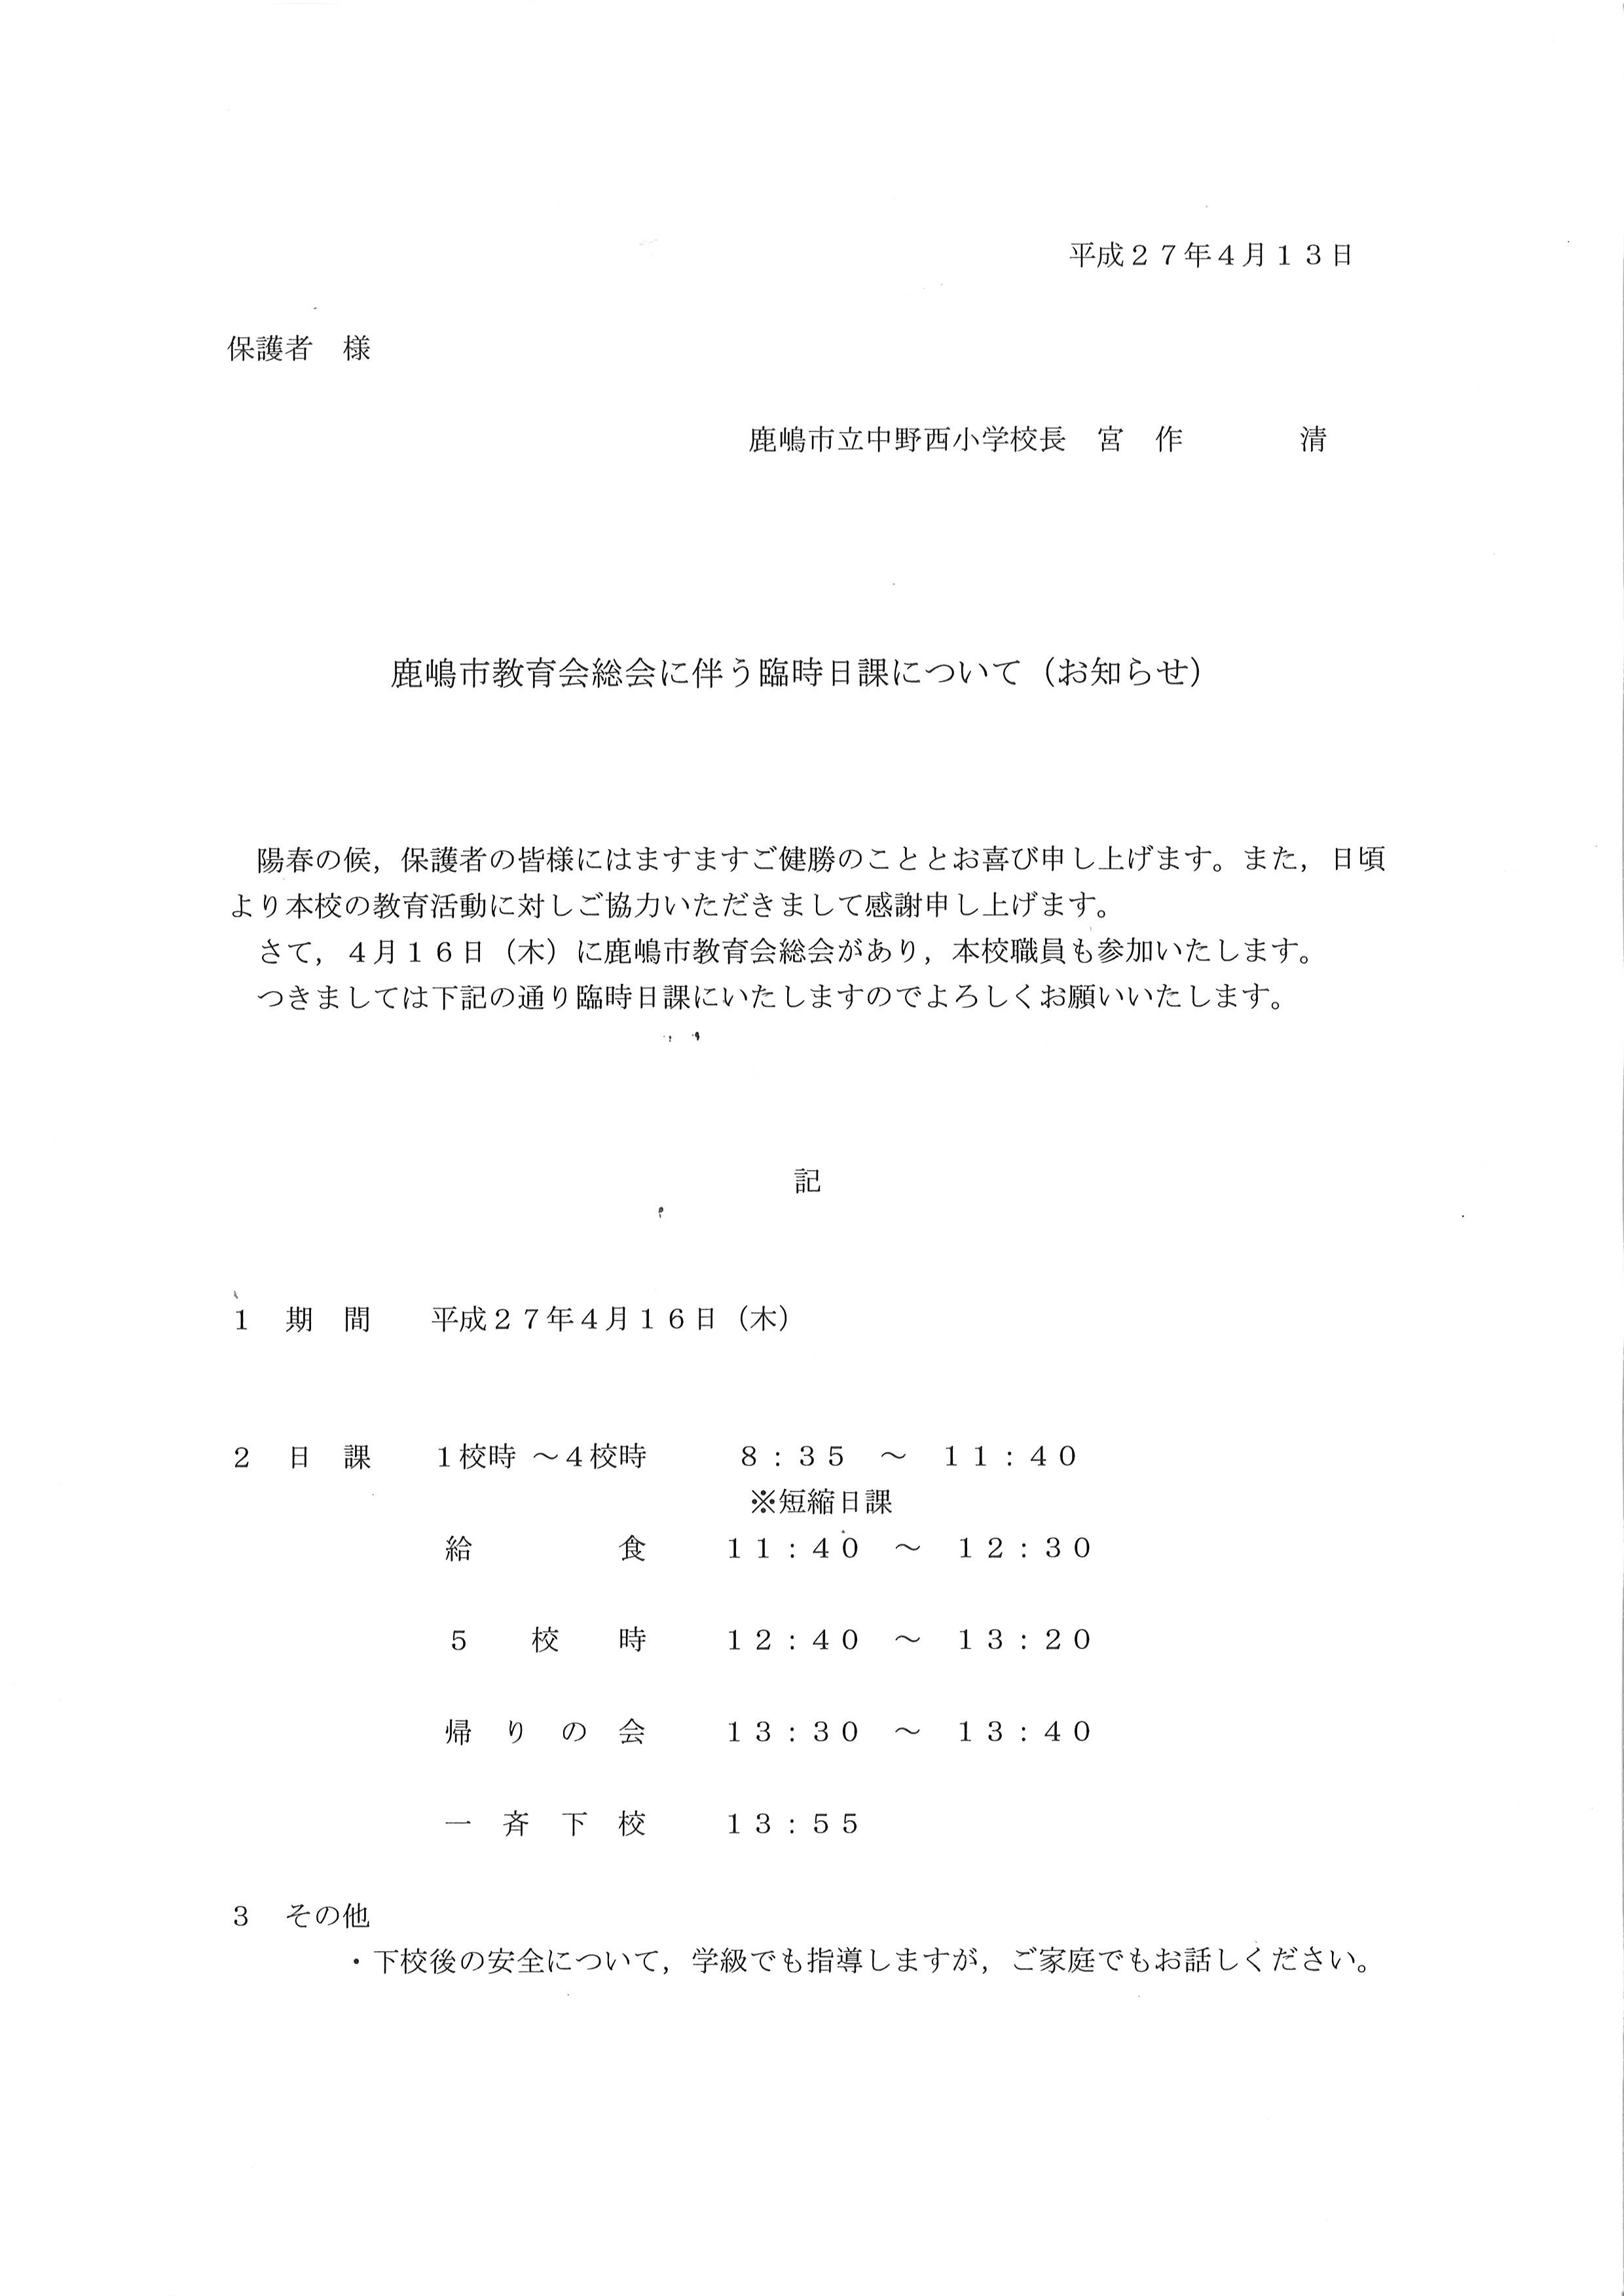 20150414075240_00001